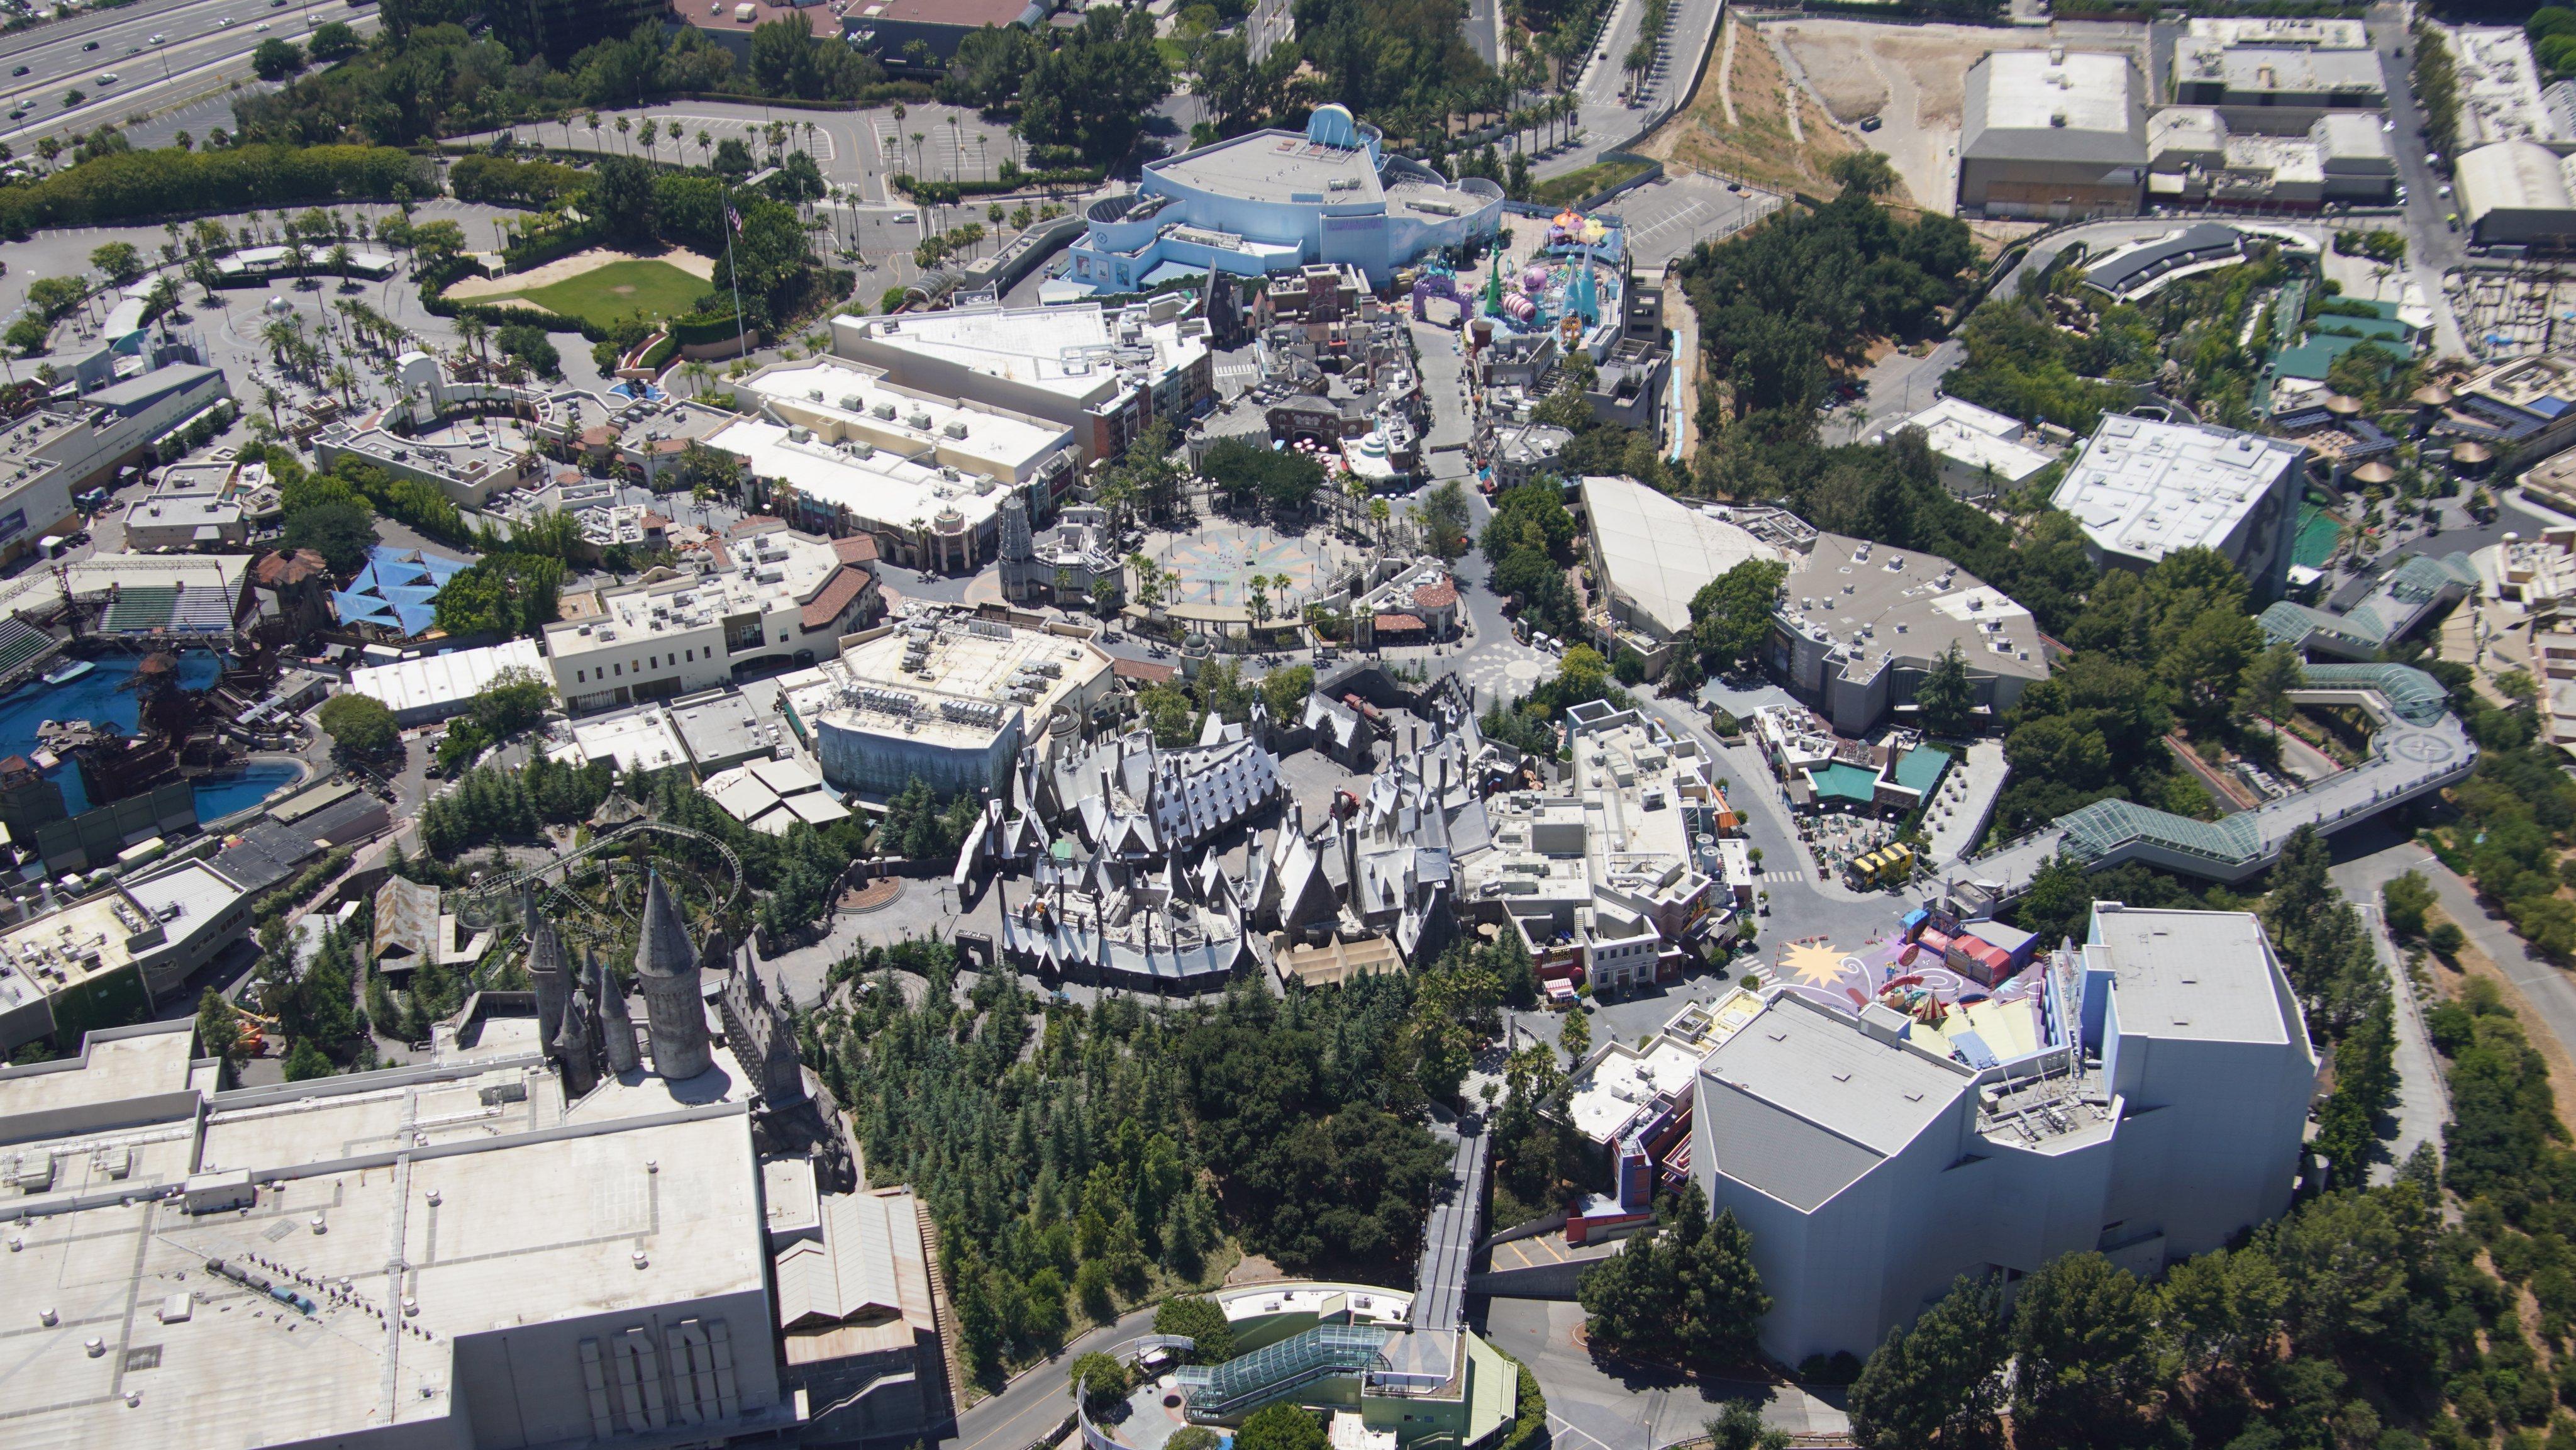 Universal Studios Hollywood [USA - 1964] - Page 21 EcpLAJ0XYAAViZM?format=jpg&name=4096x4096